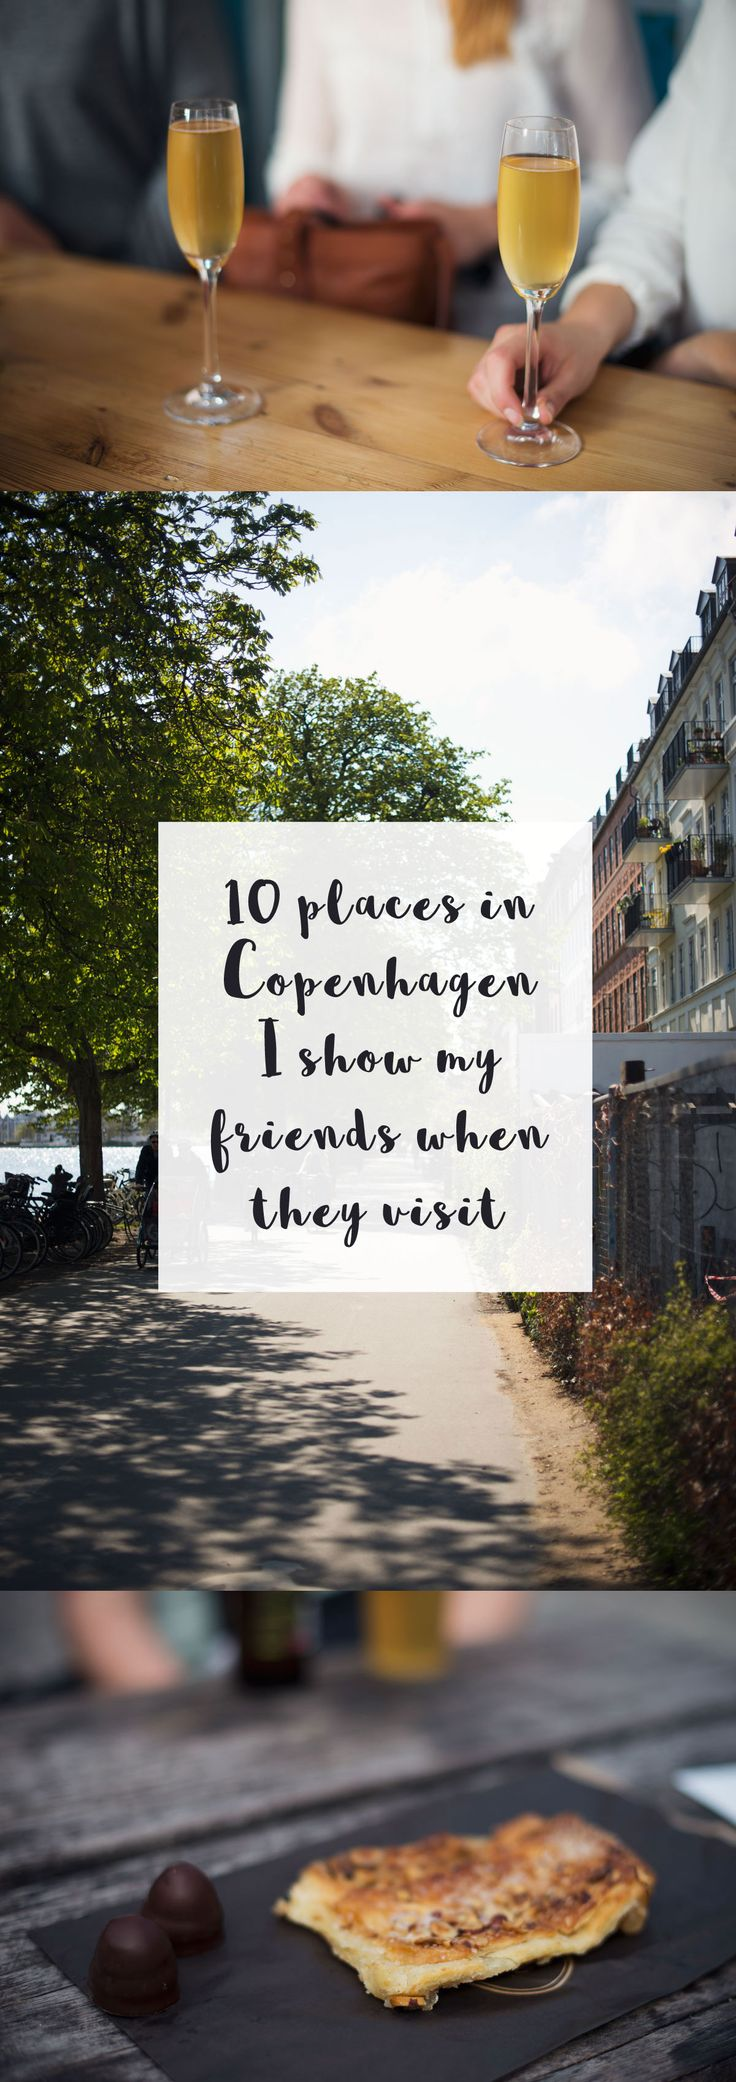 10 places in Copenhagen I show my friends when they visit | Guide To Copenhagen | Bloglovin'